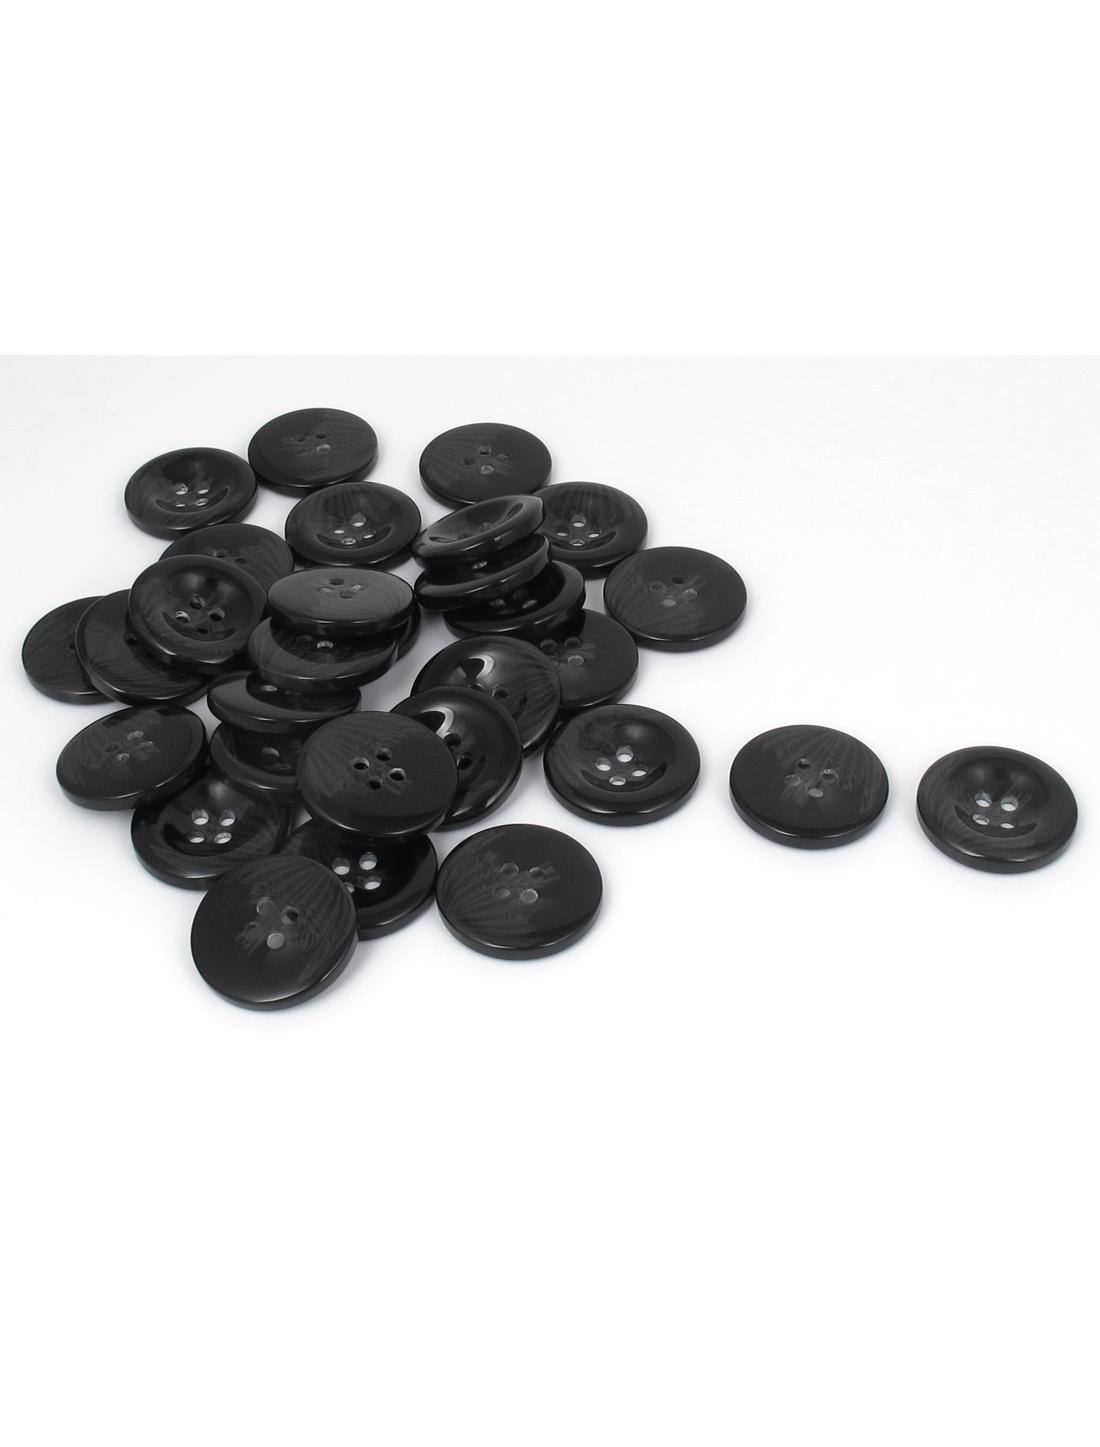 34mm Dia 4 Hole Resin Round Windbreaker Clothing Fastener Button Black 30pcs